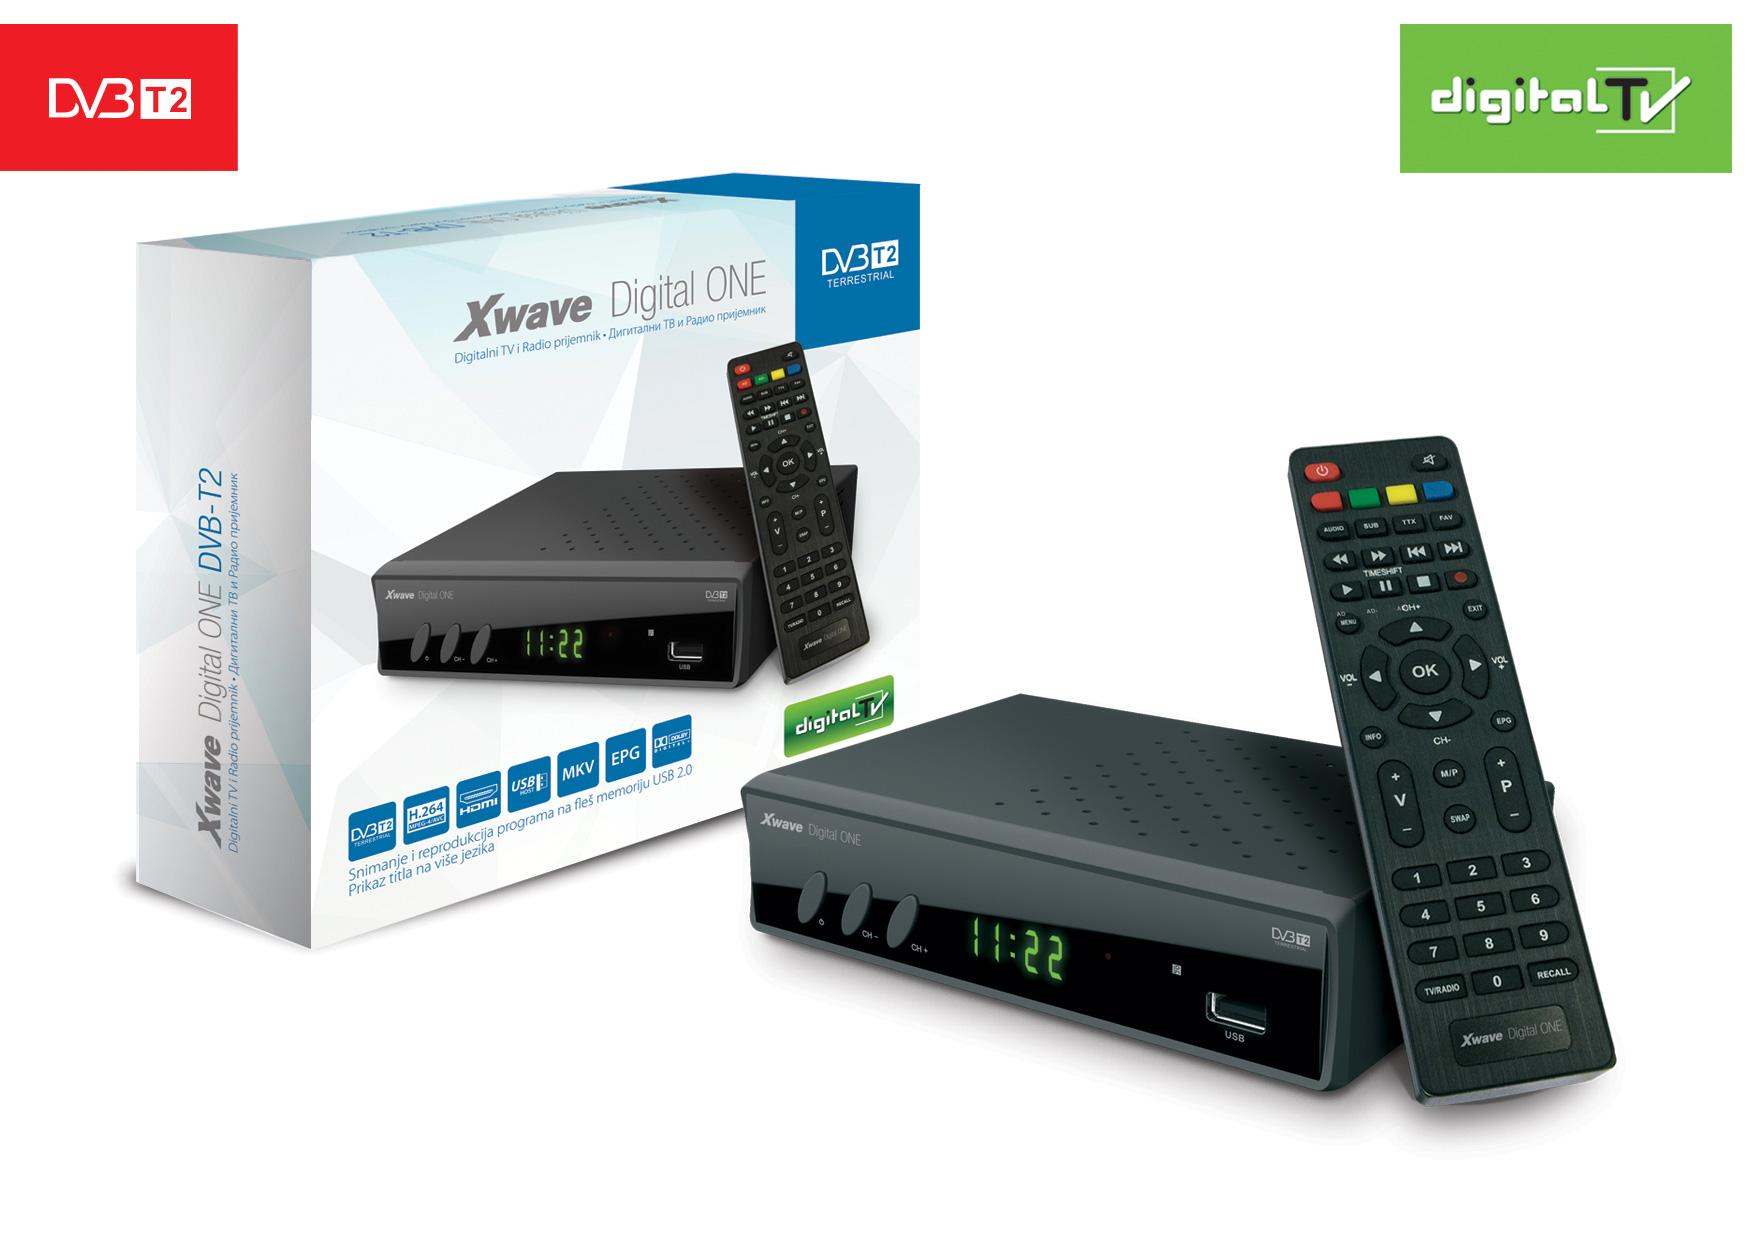 XWAVE Digital ONE DVB-T2 set top box